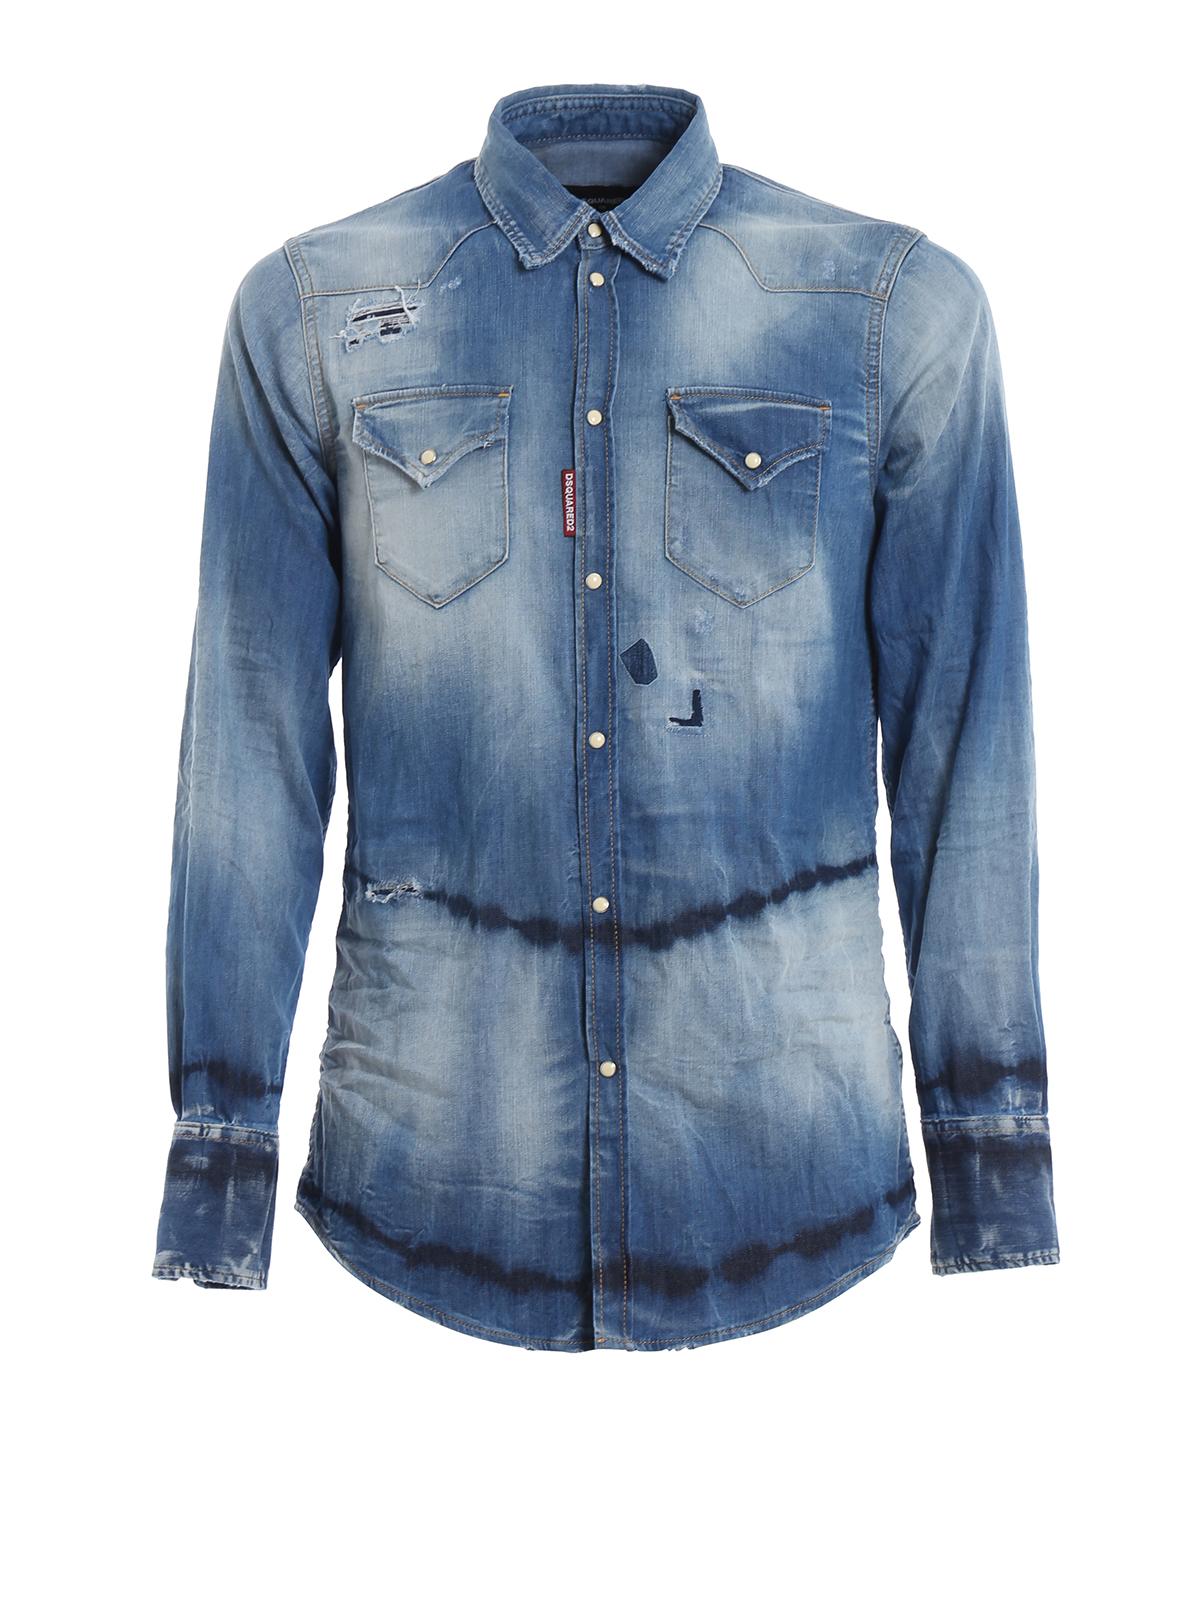 037b296402 Dsquared2 - Bleached denim shirt - shirts - S71DM0288S30341470 ...